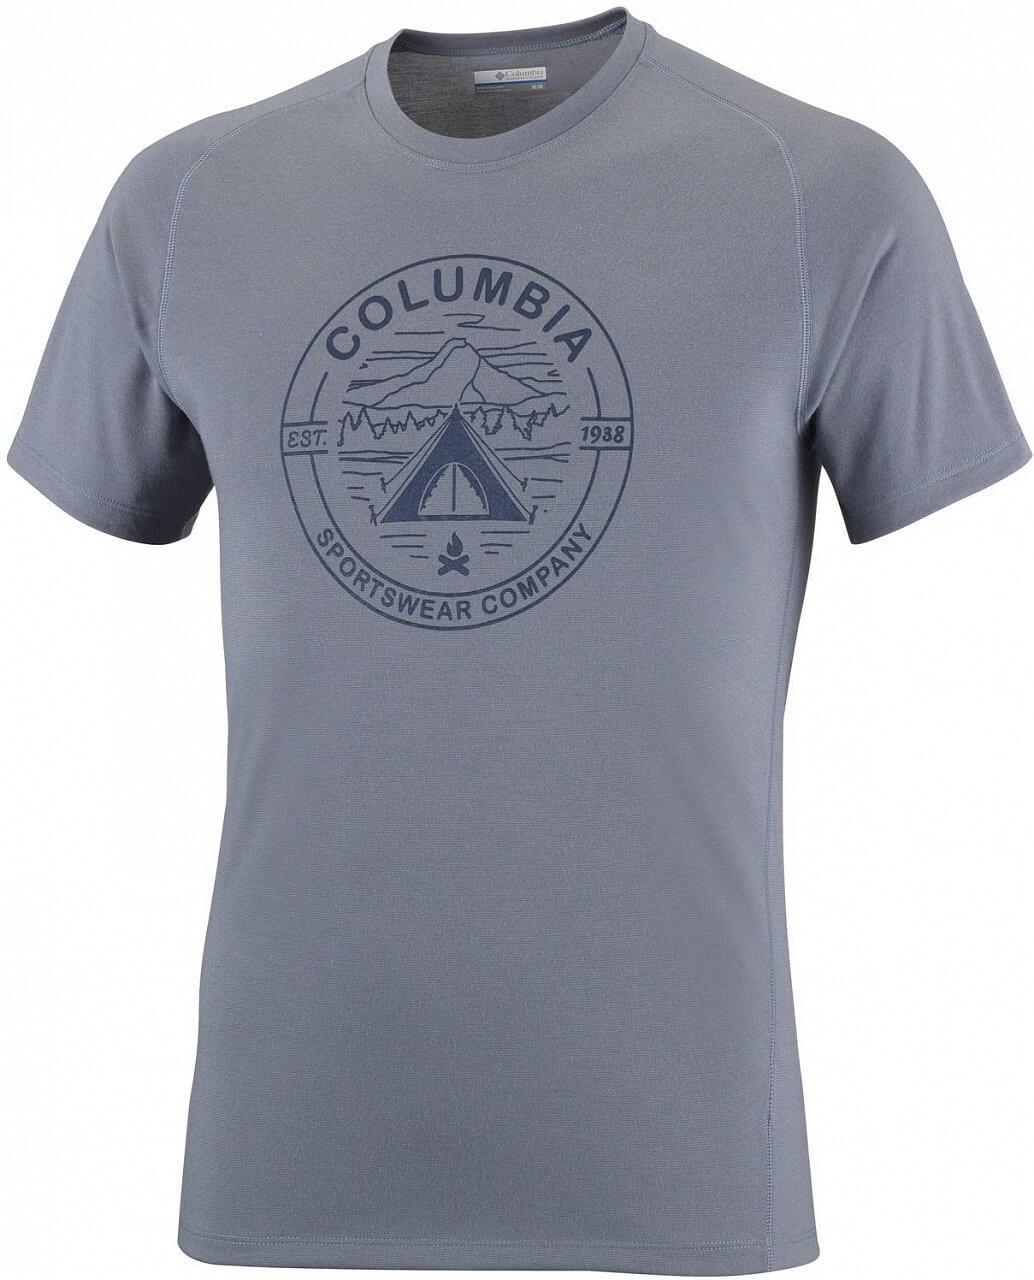 Pánské tričko Columbia Mountain Tech Logo S/S Crew